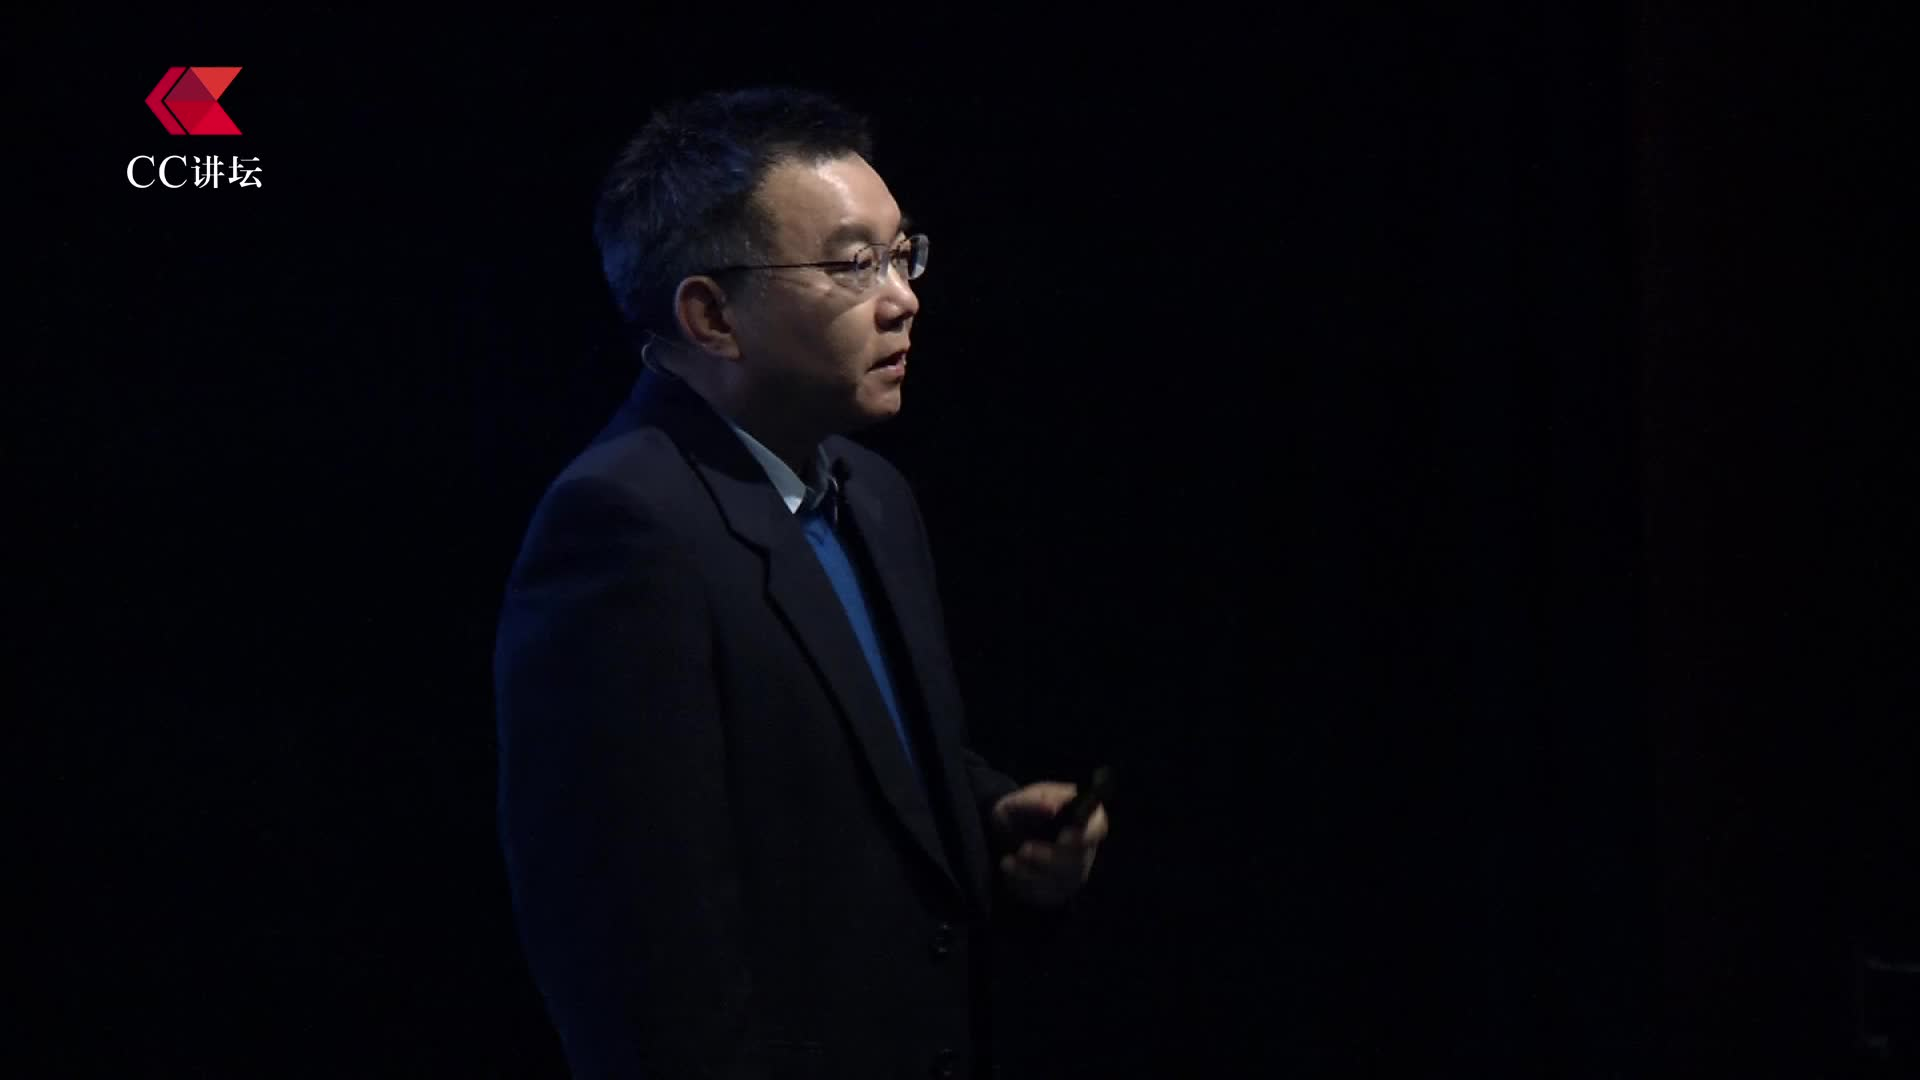 【CC讲坛-科技】储成才:找回丢失的基因,开启新的绿色革命